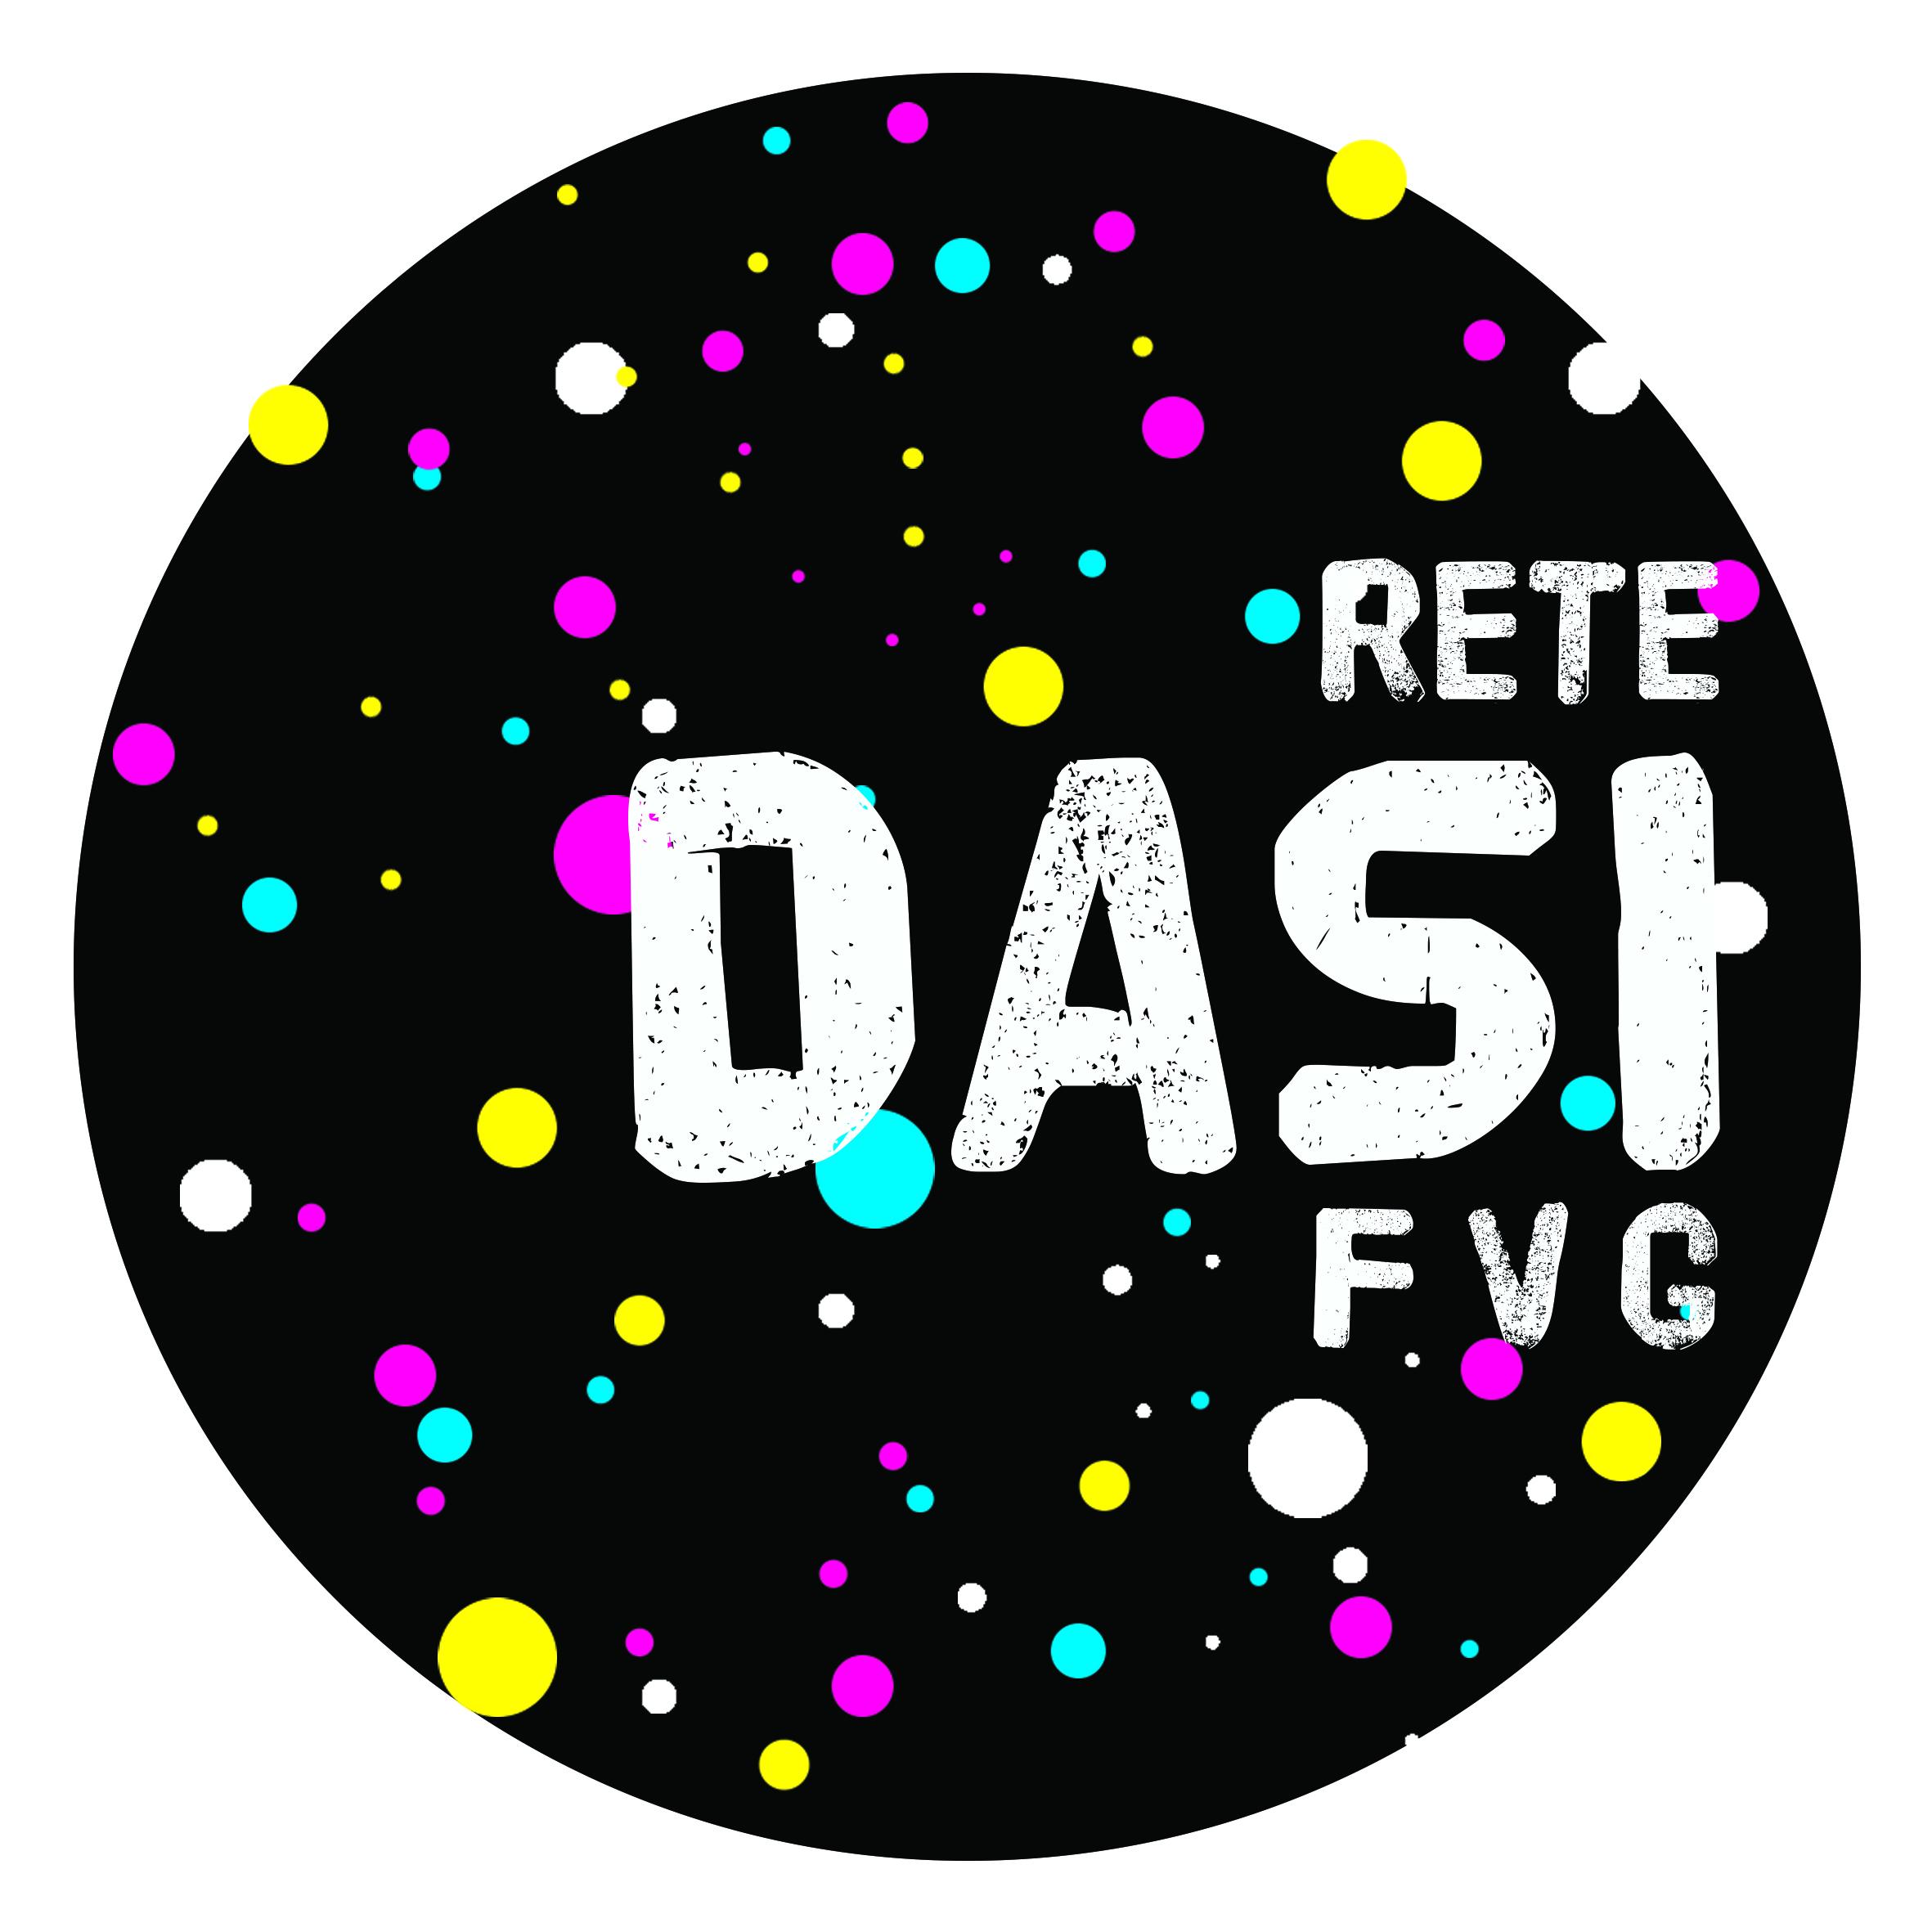 Rete DASI FVG